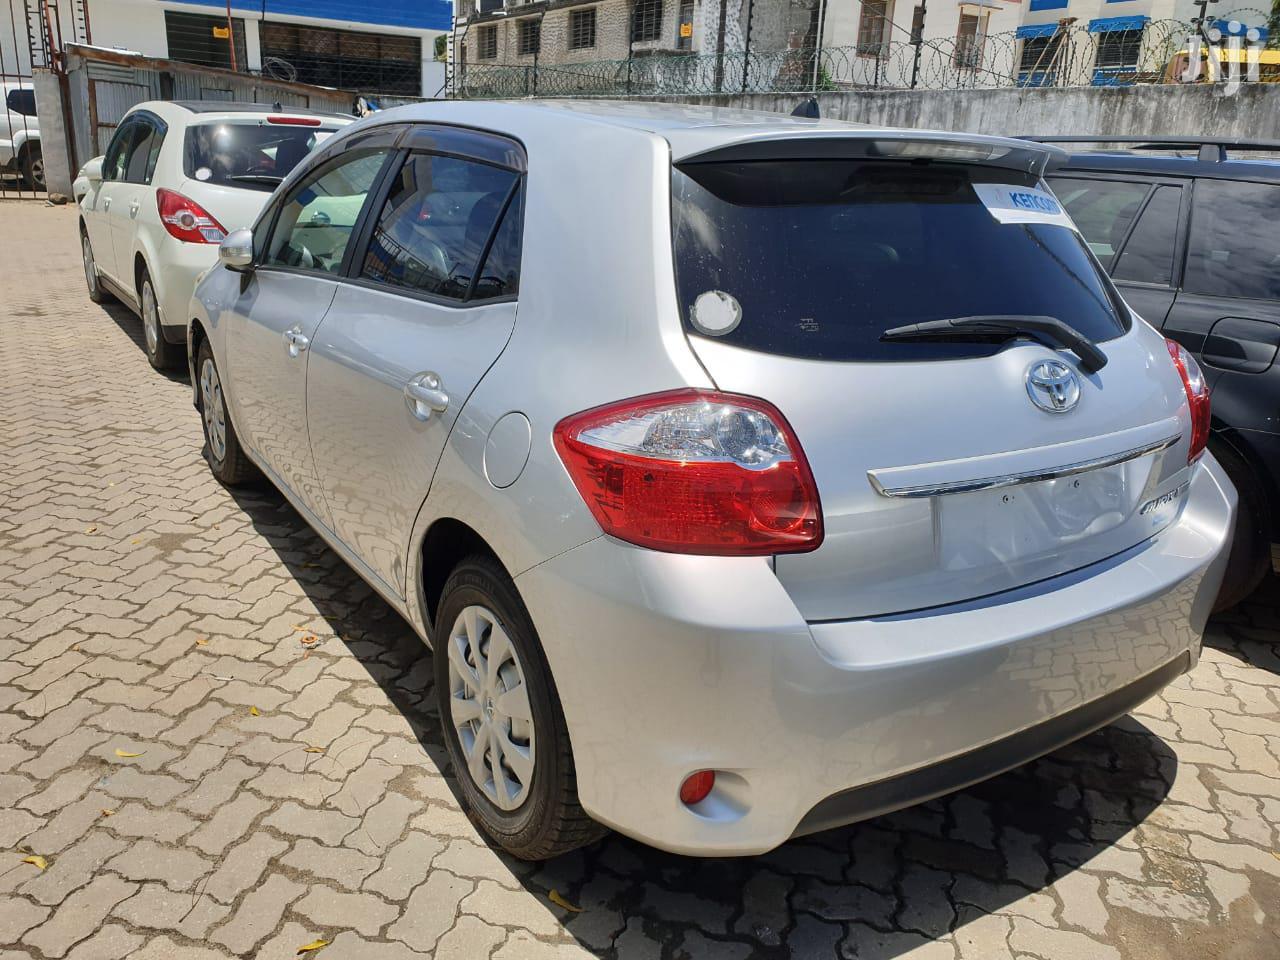 New Toyota Auris 2012 Silver | Cars for sale in Tononoka, Mombasa, Kenya